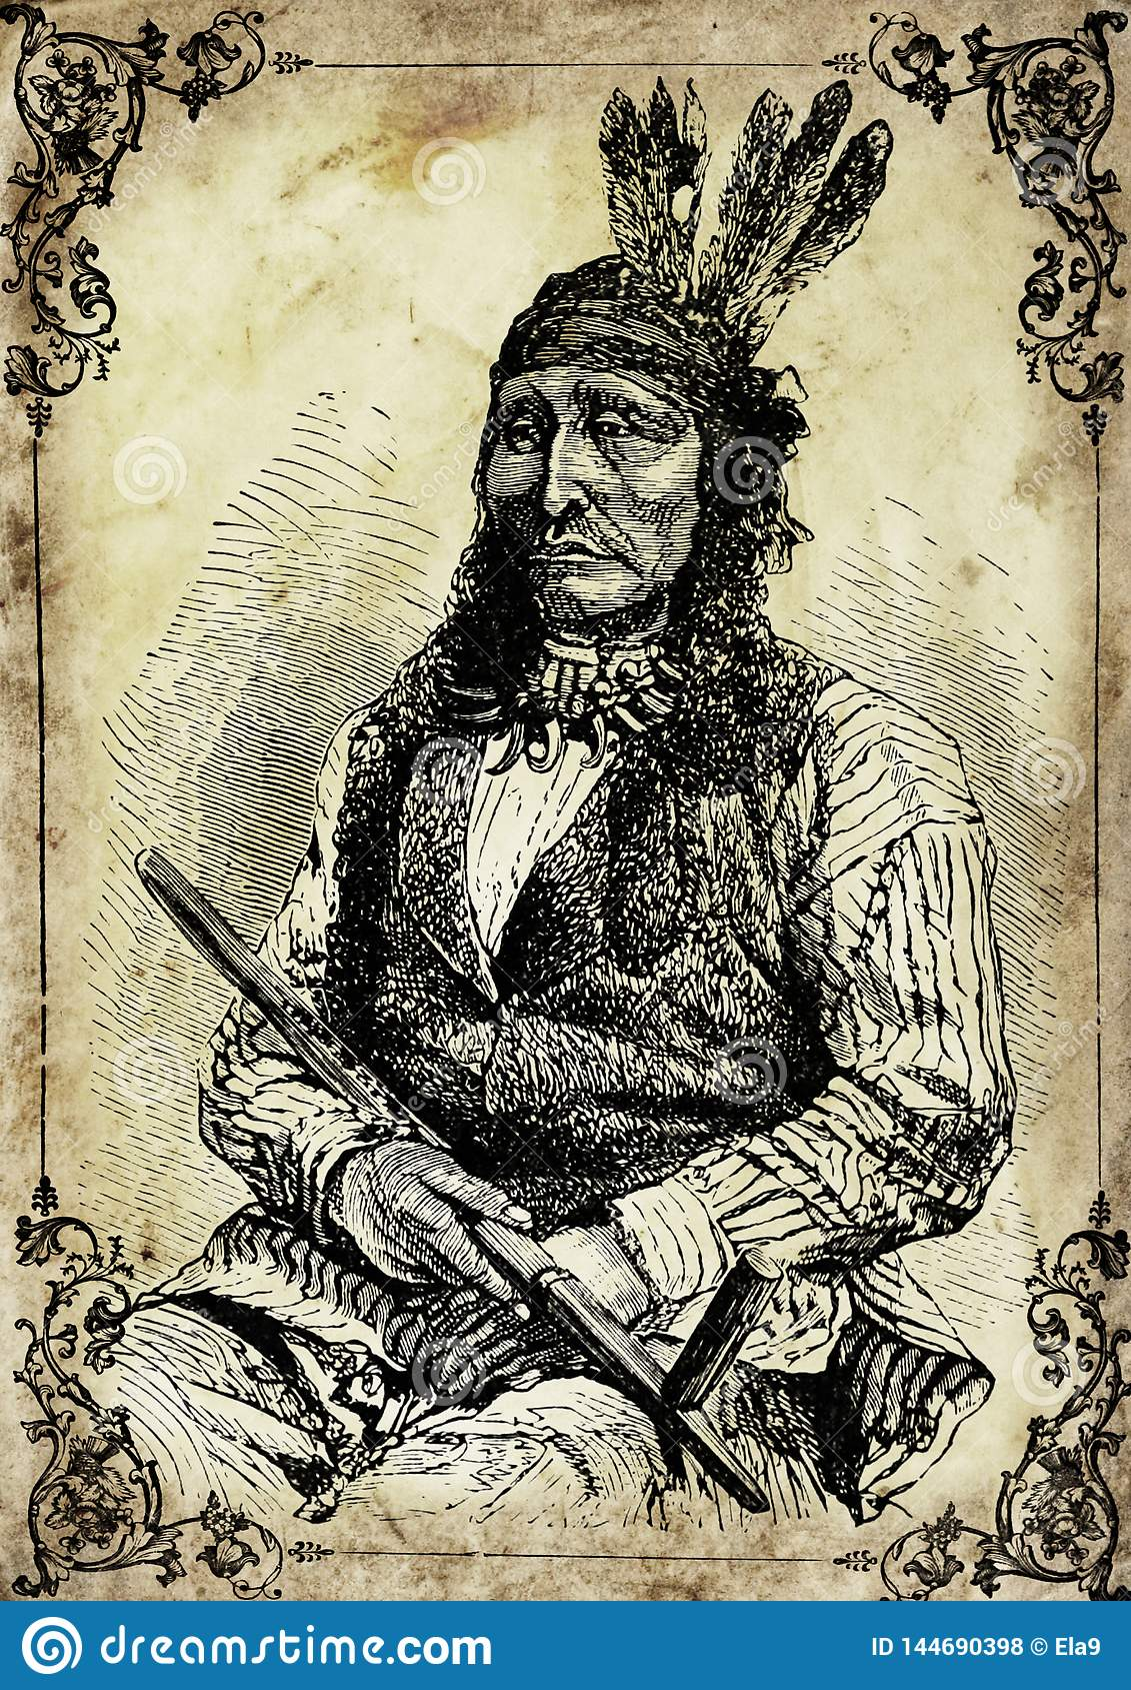 Vintage illustration of Native American